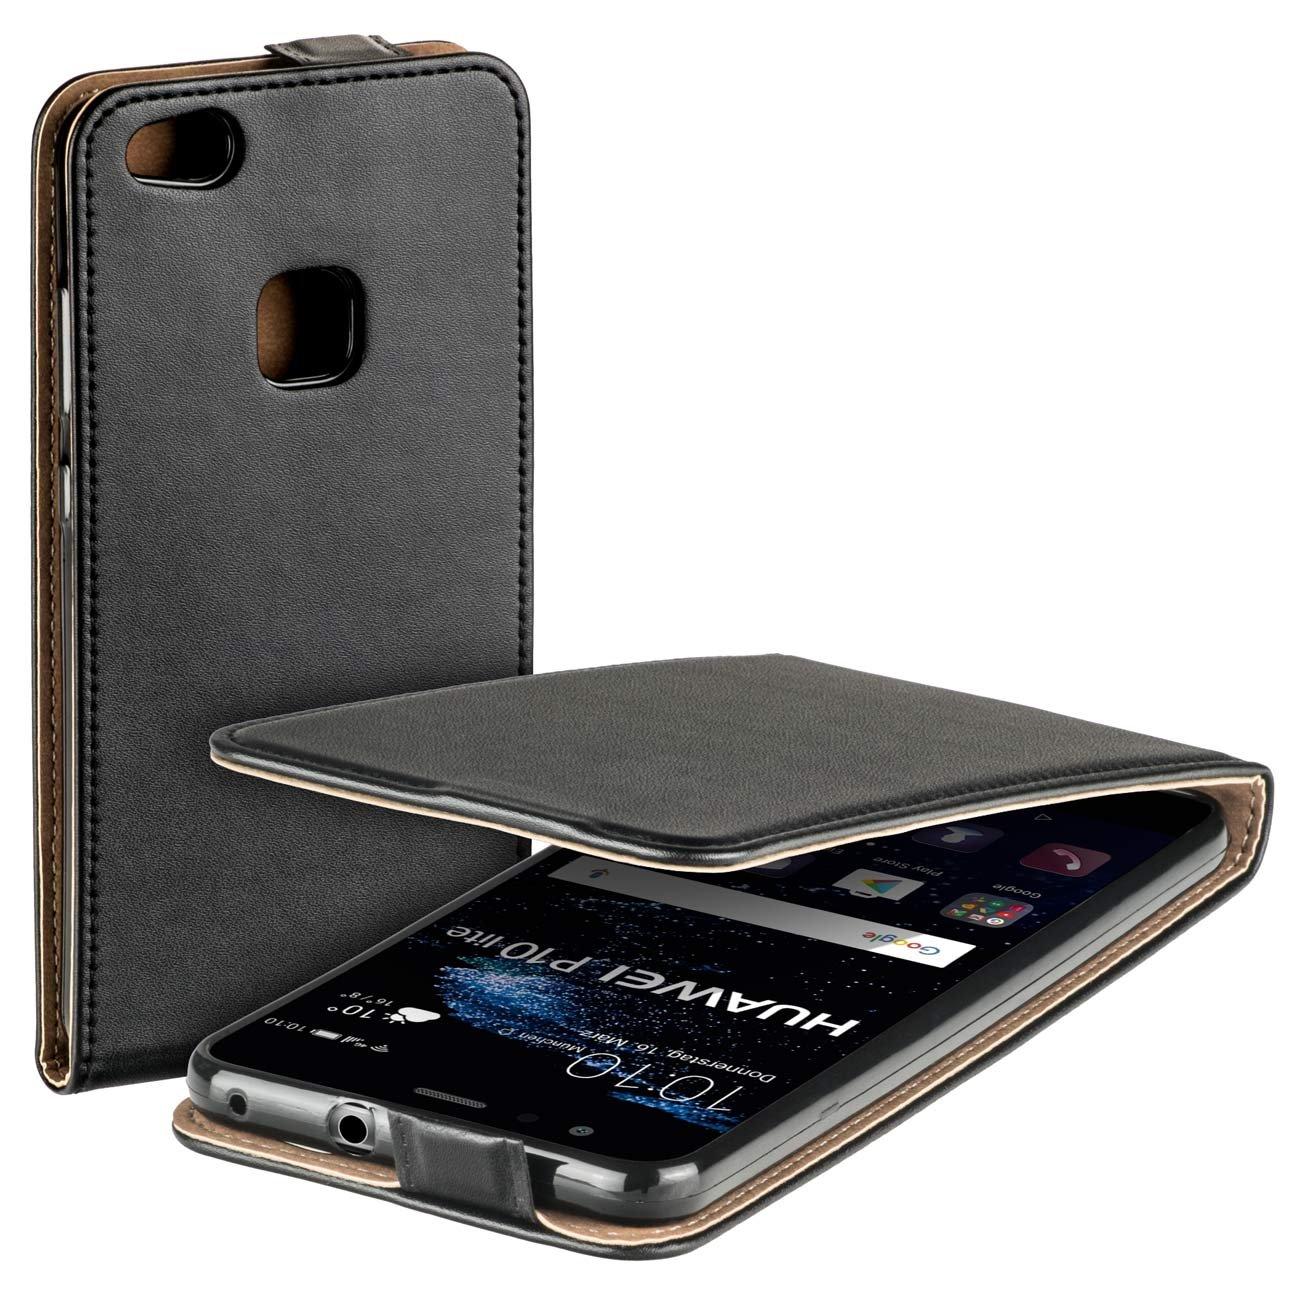 Huawei P10 Huawei Lite/ P10 Liteデュアル/ブラック用Yayagoプレミアムフリップスタイルレザーケース/ B06XRF5ZN2 B06XRF5ZN2, ヤカゲチョウ:65584500 --- cooleycoastrun.com